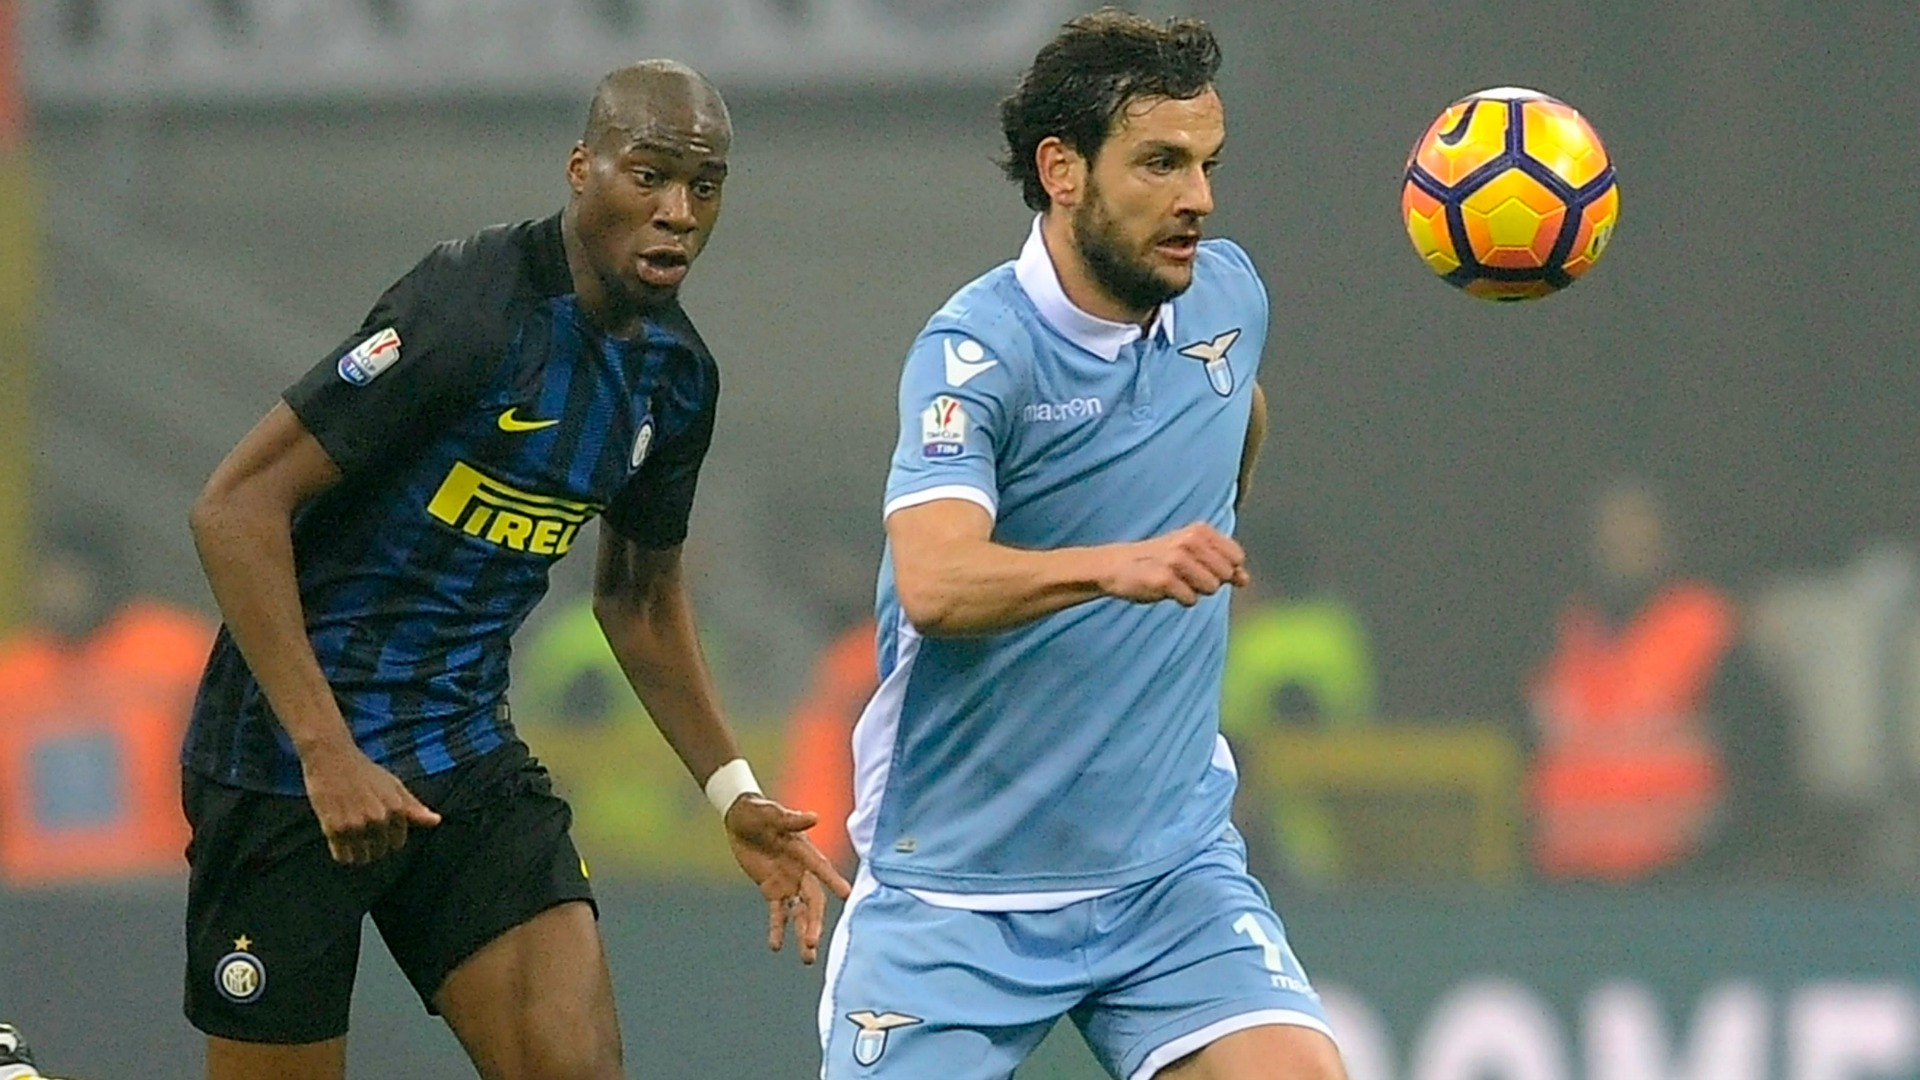 Geoffrey Kondogbia Marco Parolo Inter Lazio